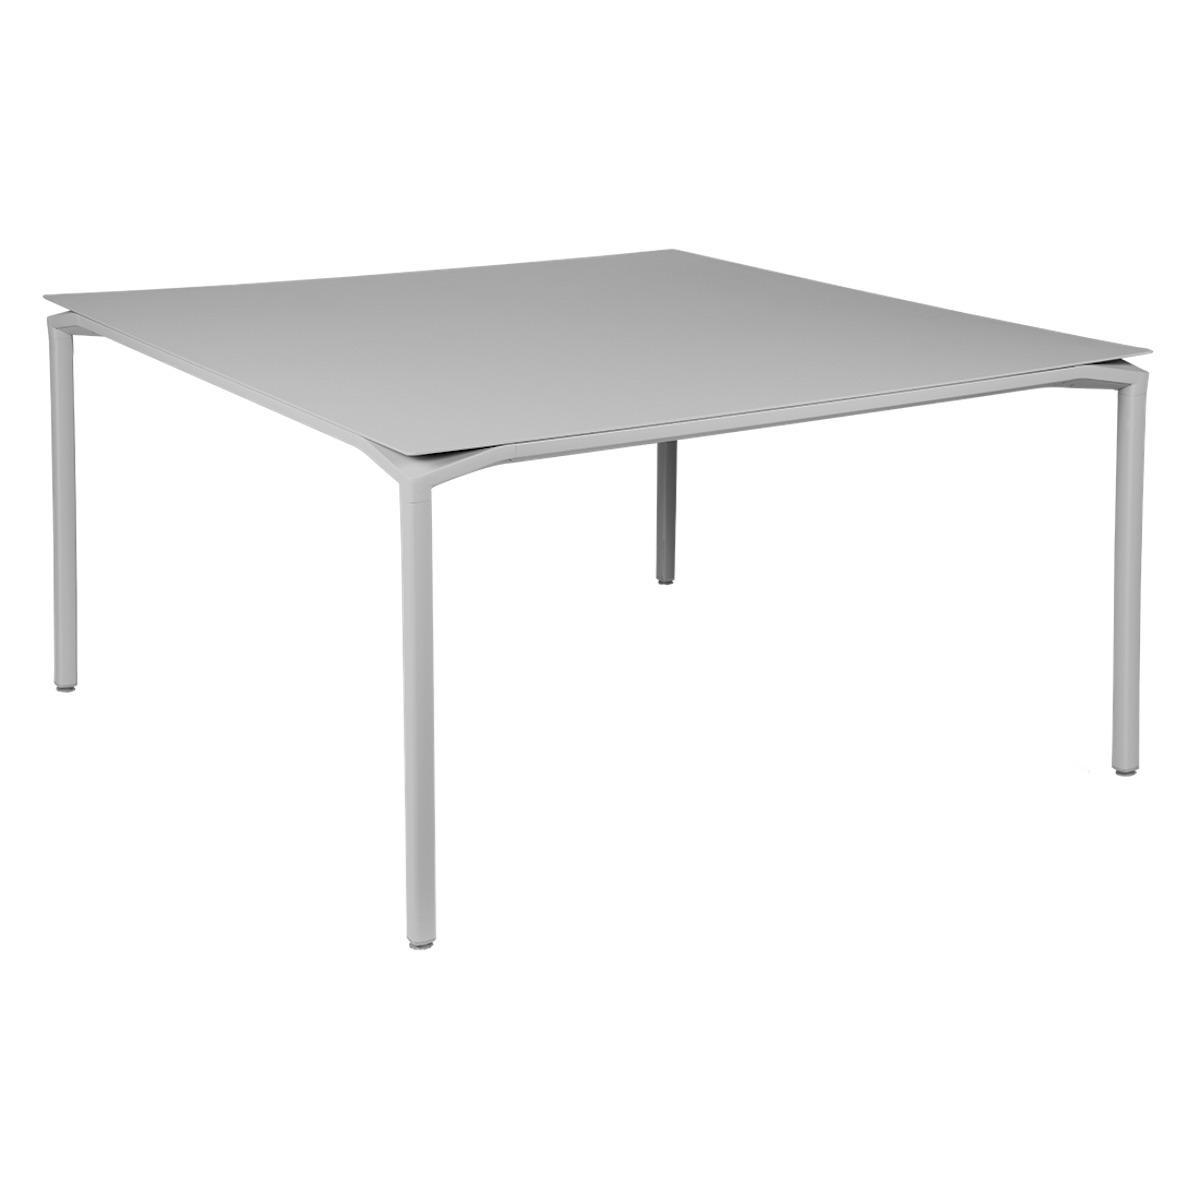 Table 140x140cm CALVI Fermob gris métal